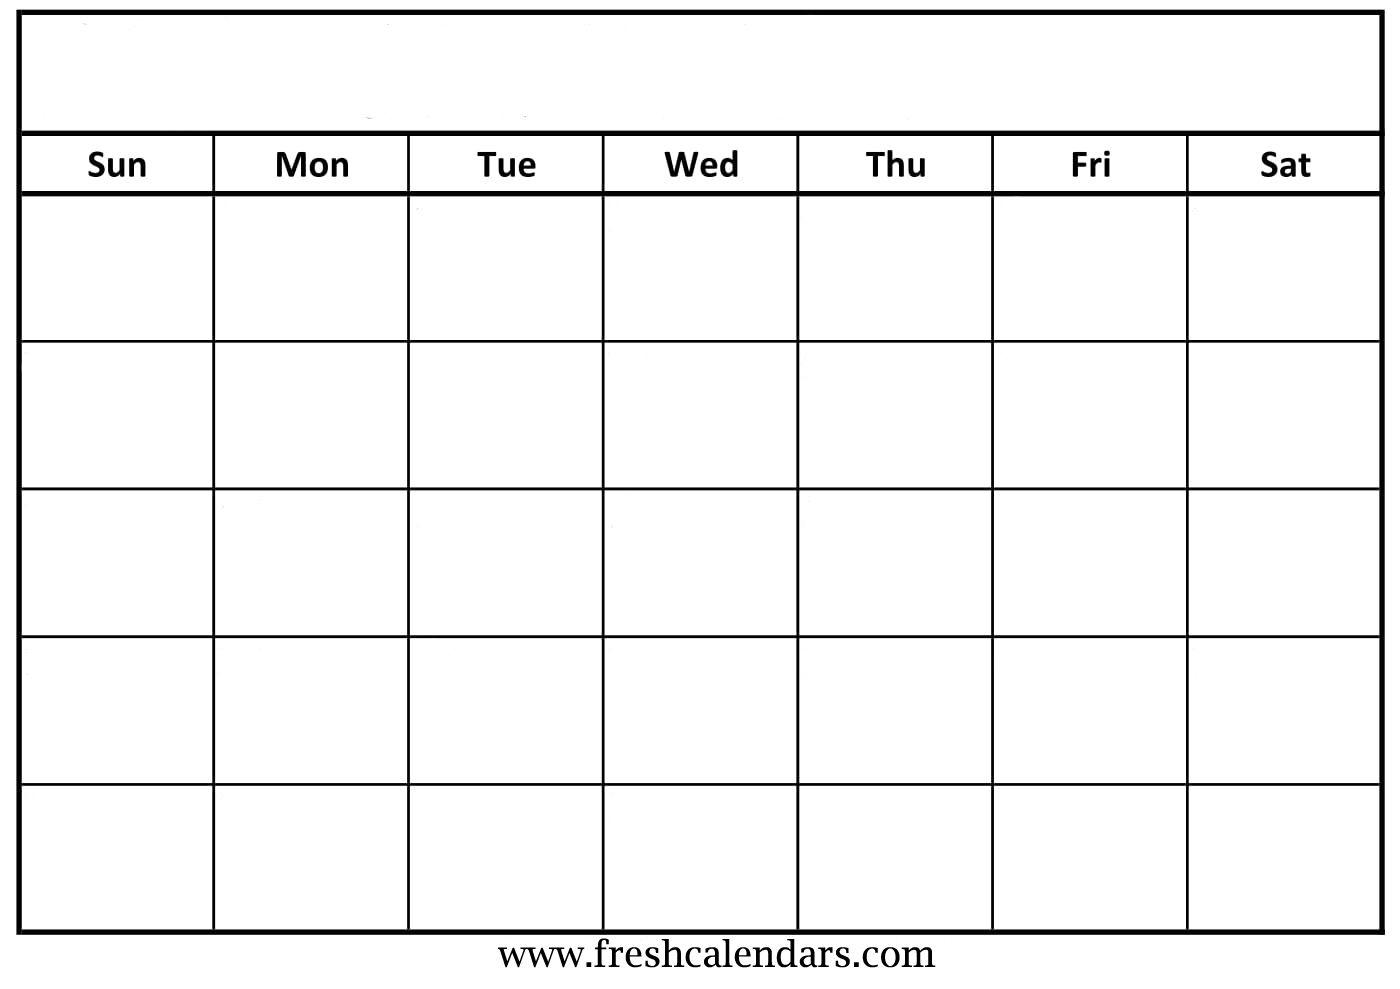 Blank Calendar: Wonderfully Printable 2019 Templates inside Need A Blank Calendar With Lines